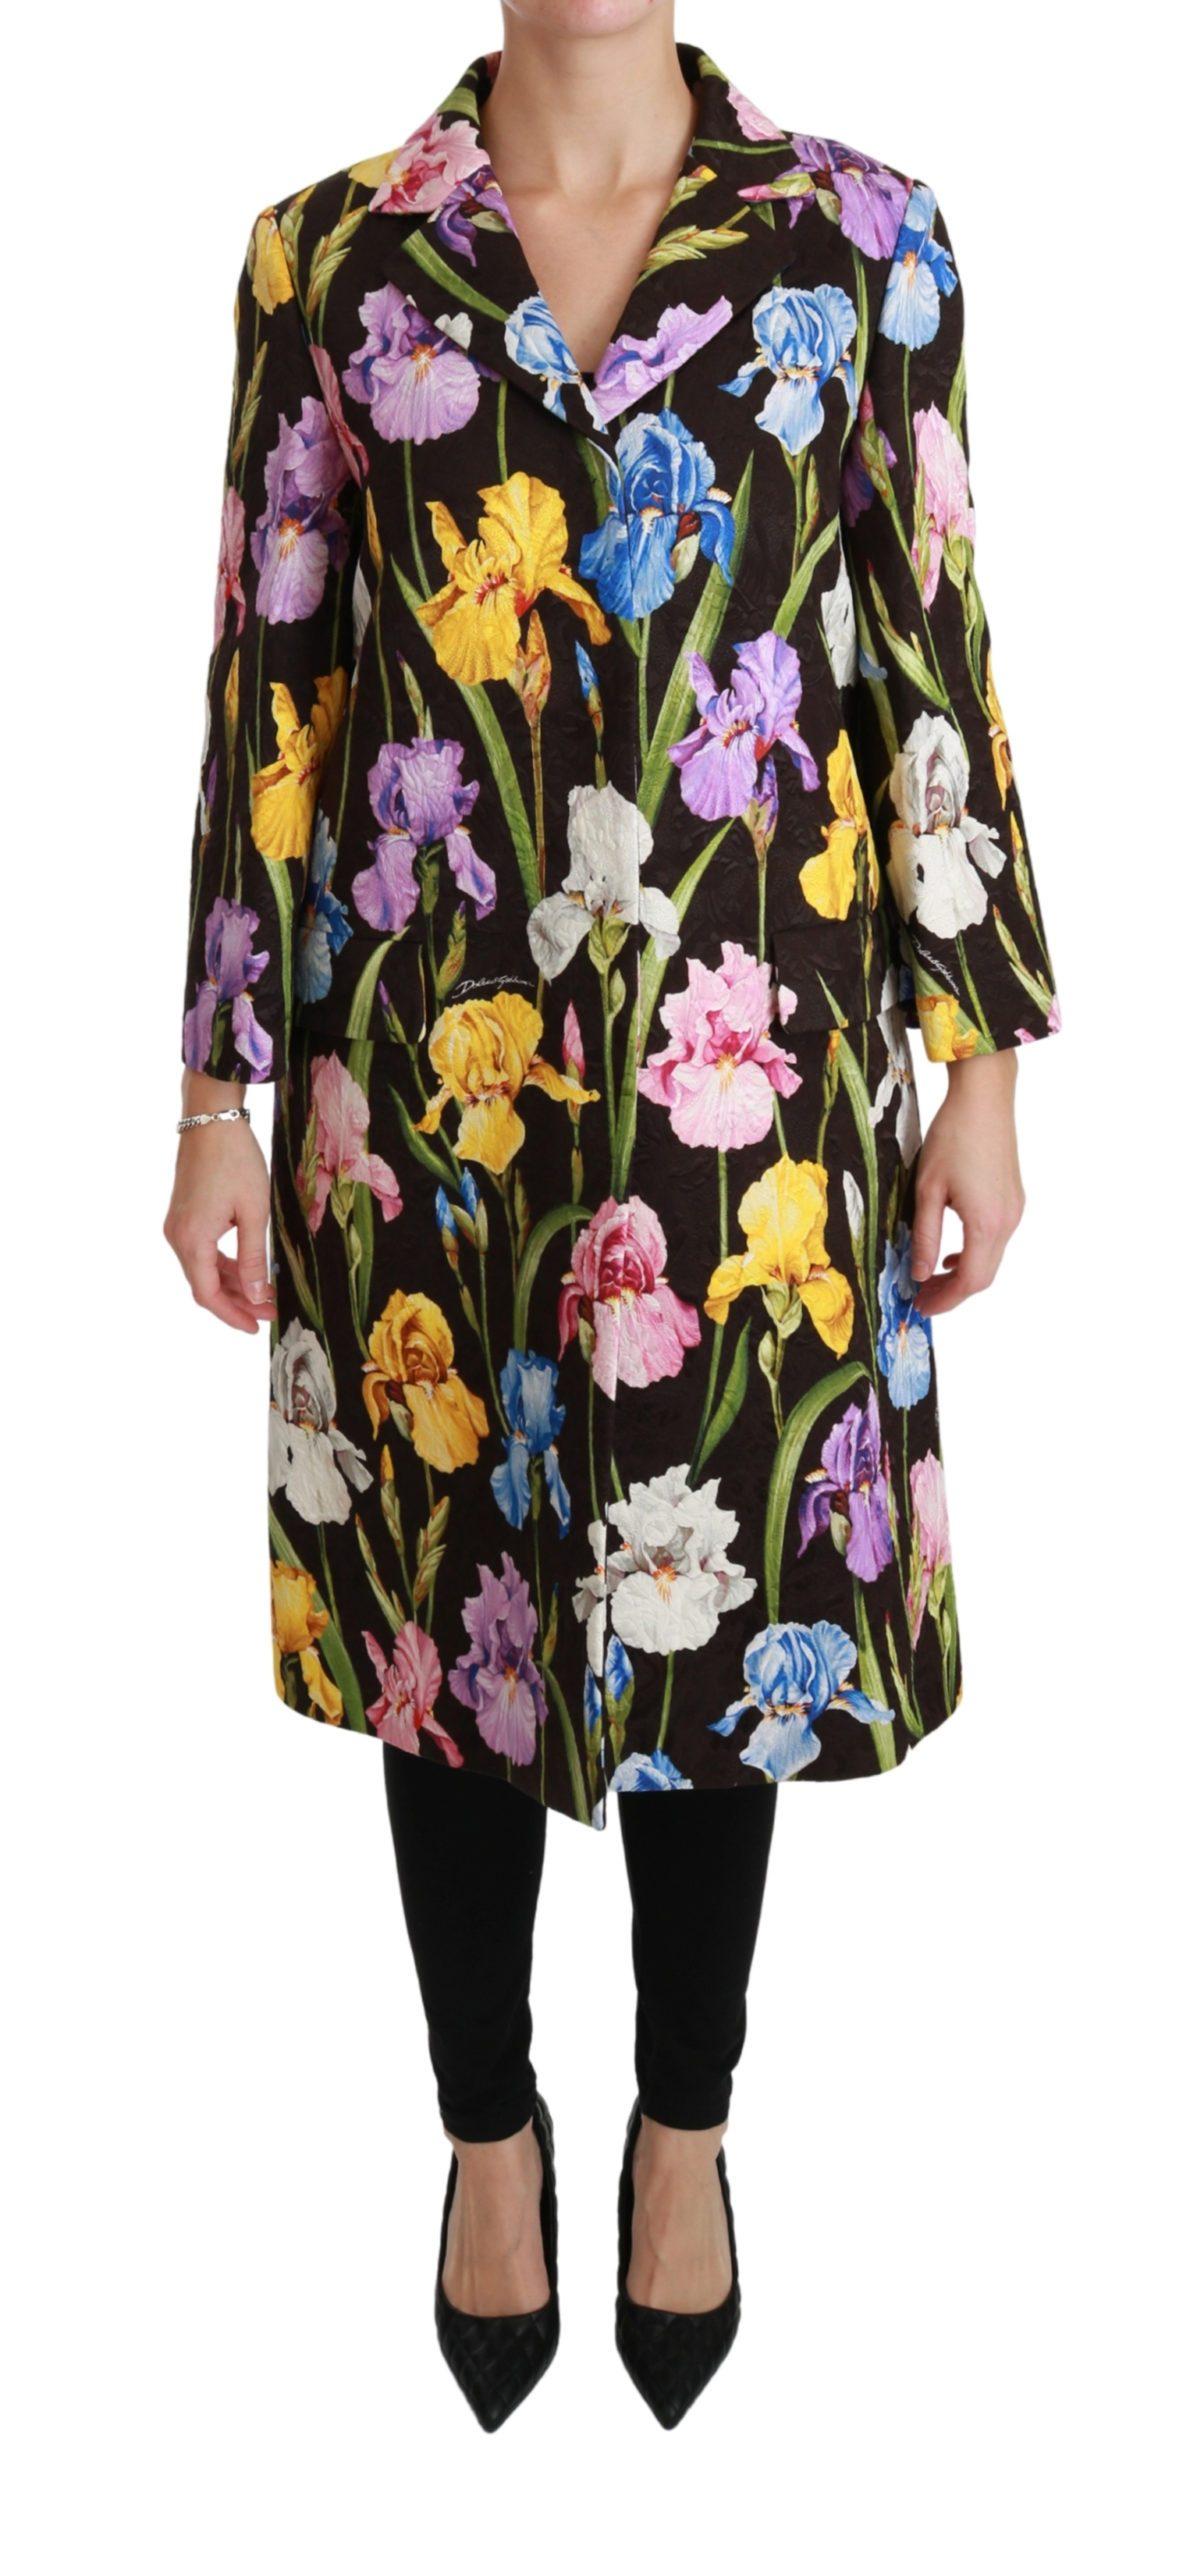 Dolce & Gabbana Women's Floral Brocade Coat Black JKT2582-36 - IT36 | XS